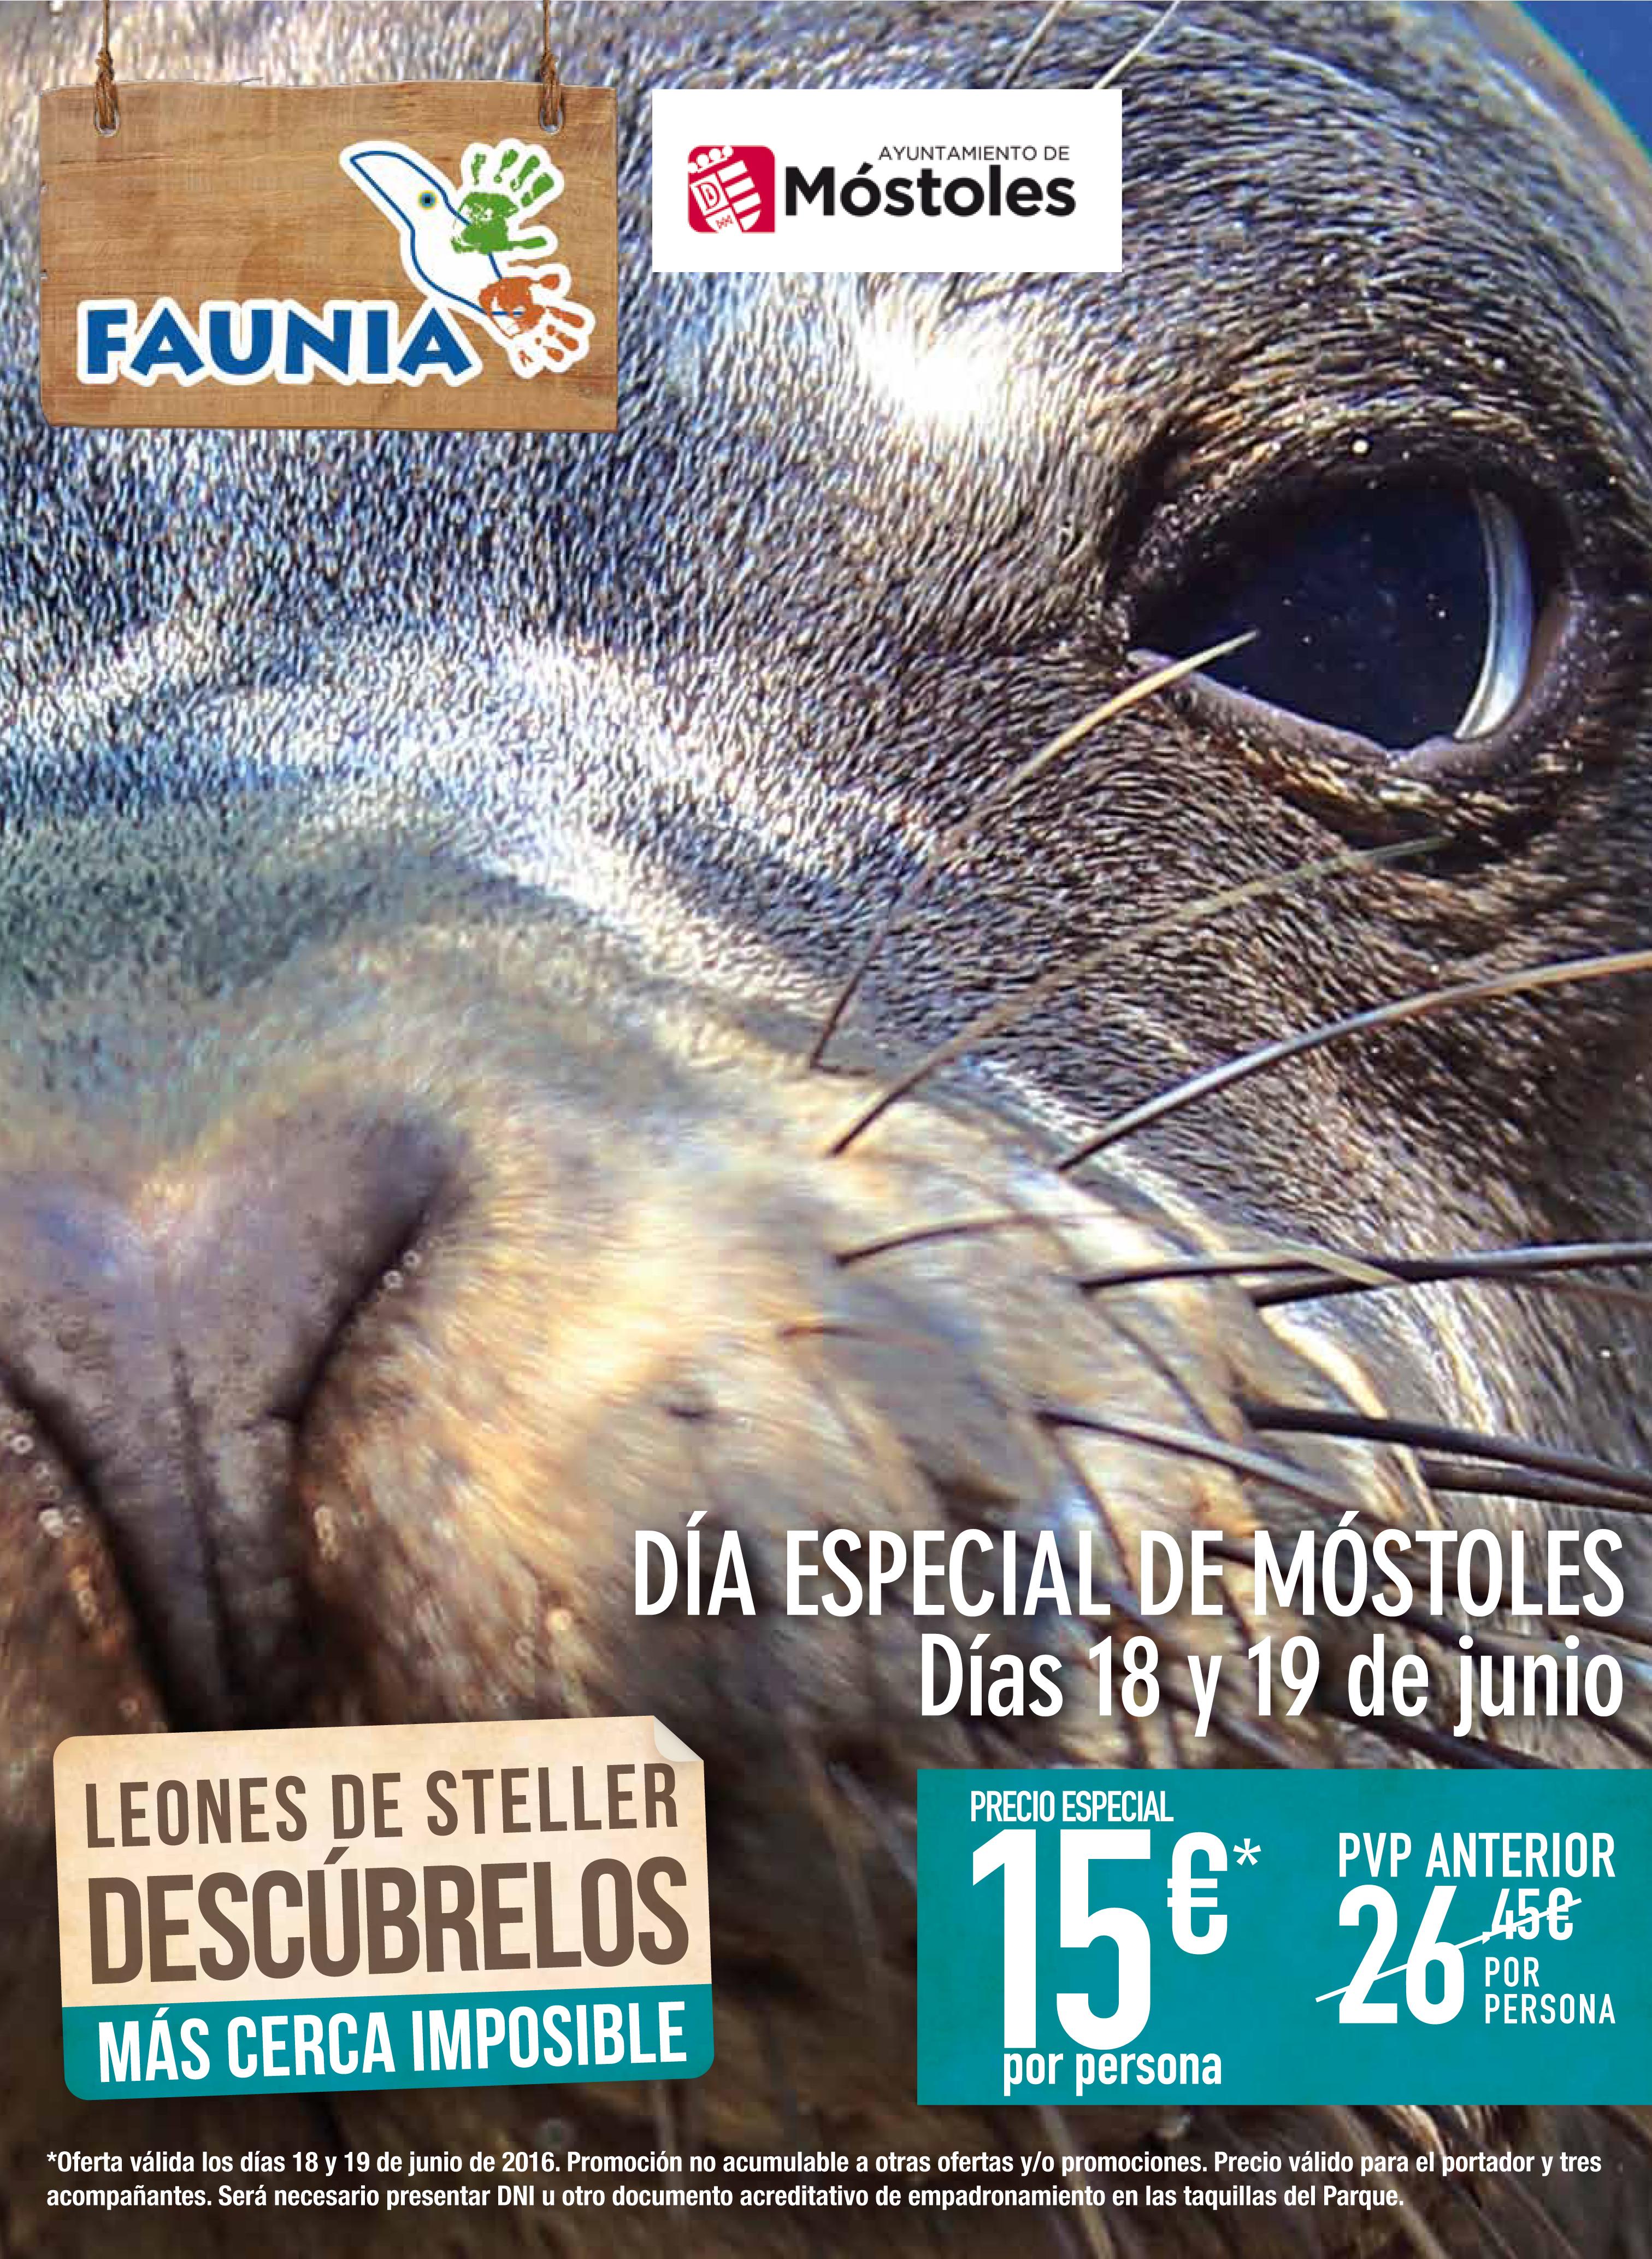 OPEN DAYS FAUNIA MOSTOLES 26x35cm